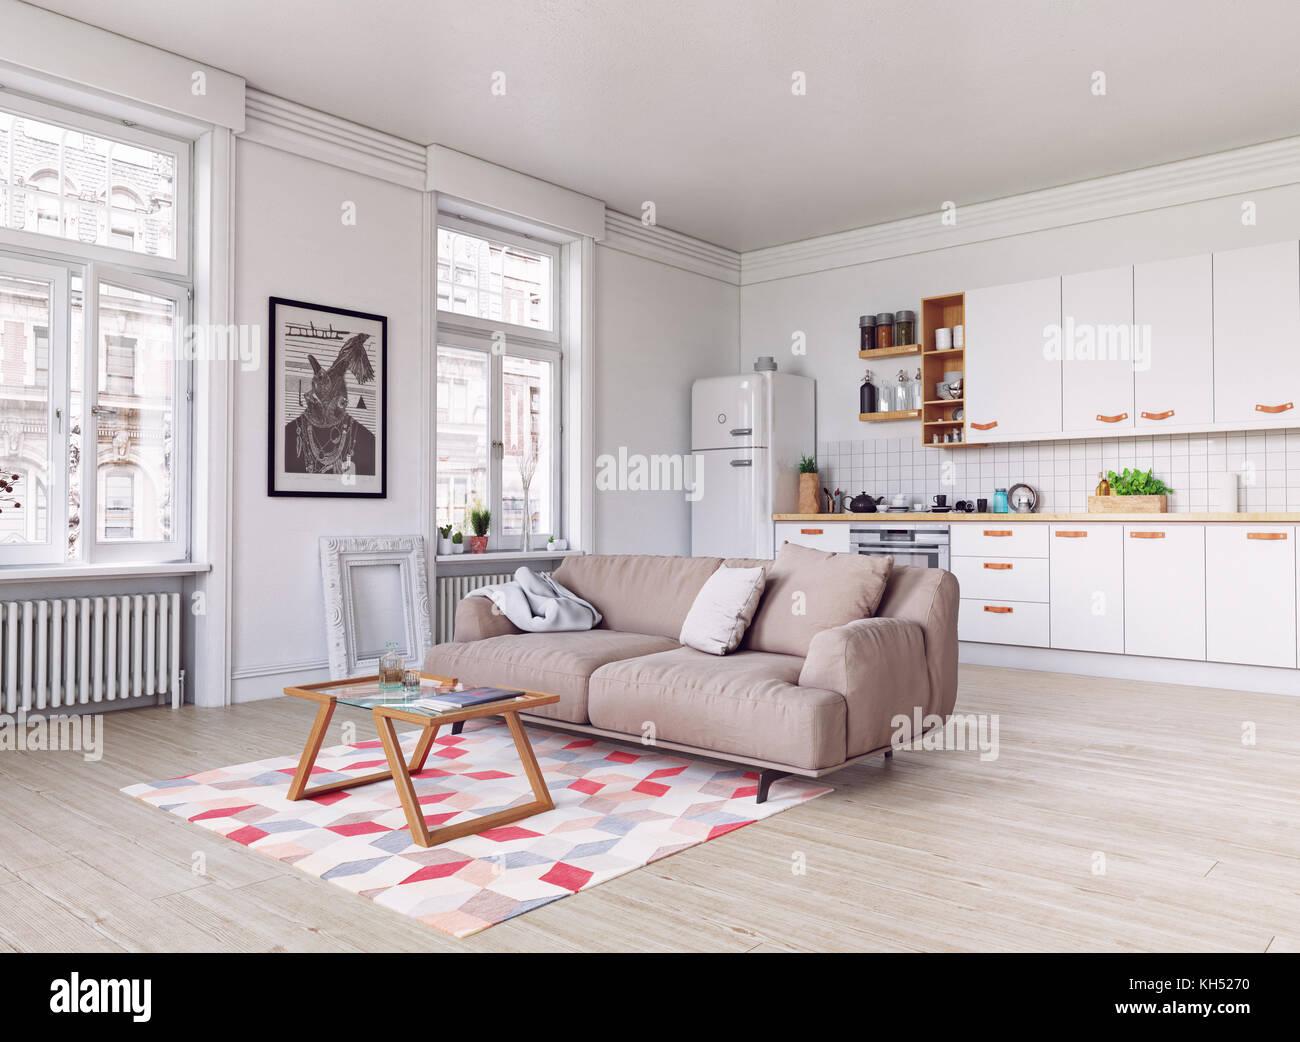 https://c8.alamy.com/compde/kh5270/moderne-kuche-interieur-skandinavisches-design-3d-rendering-konzept-kh5270.jpg